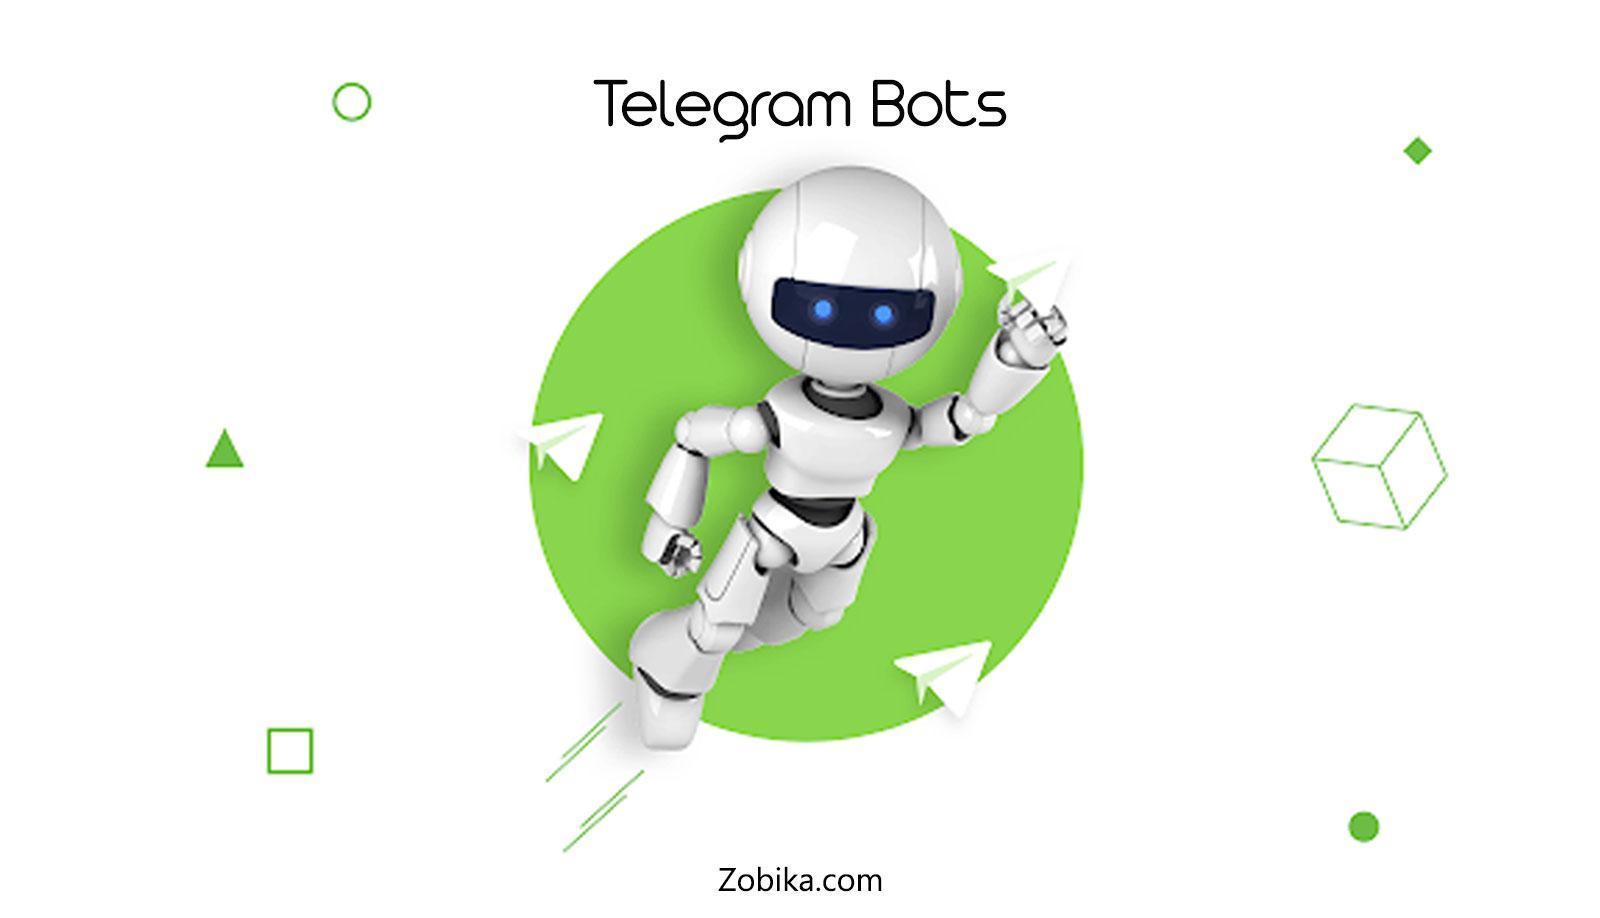 Everything about Telegram Bots